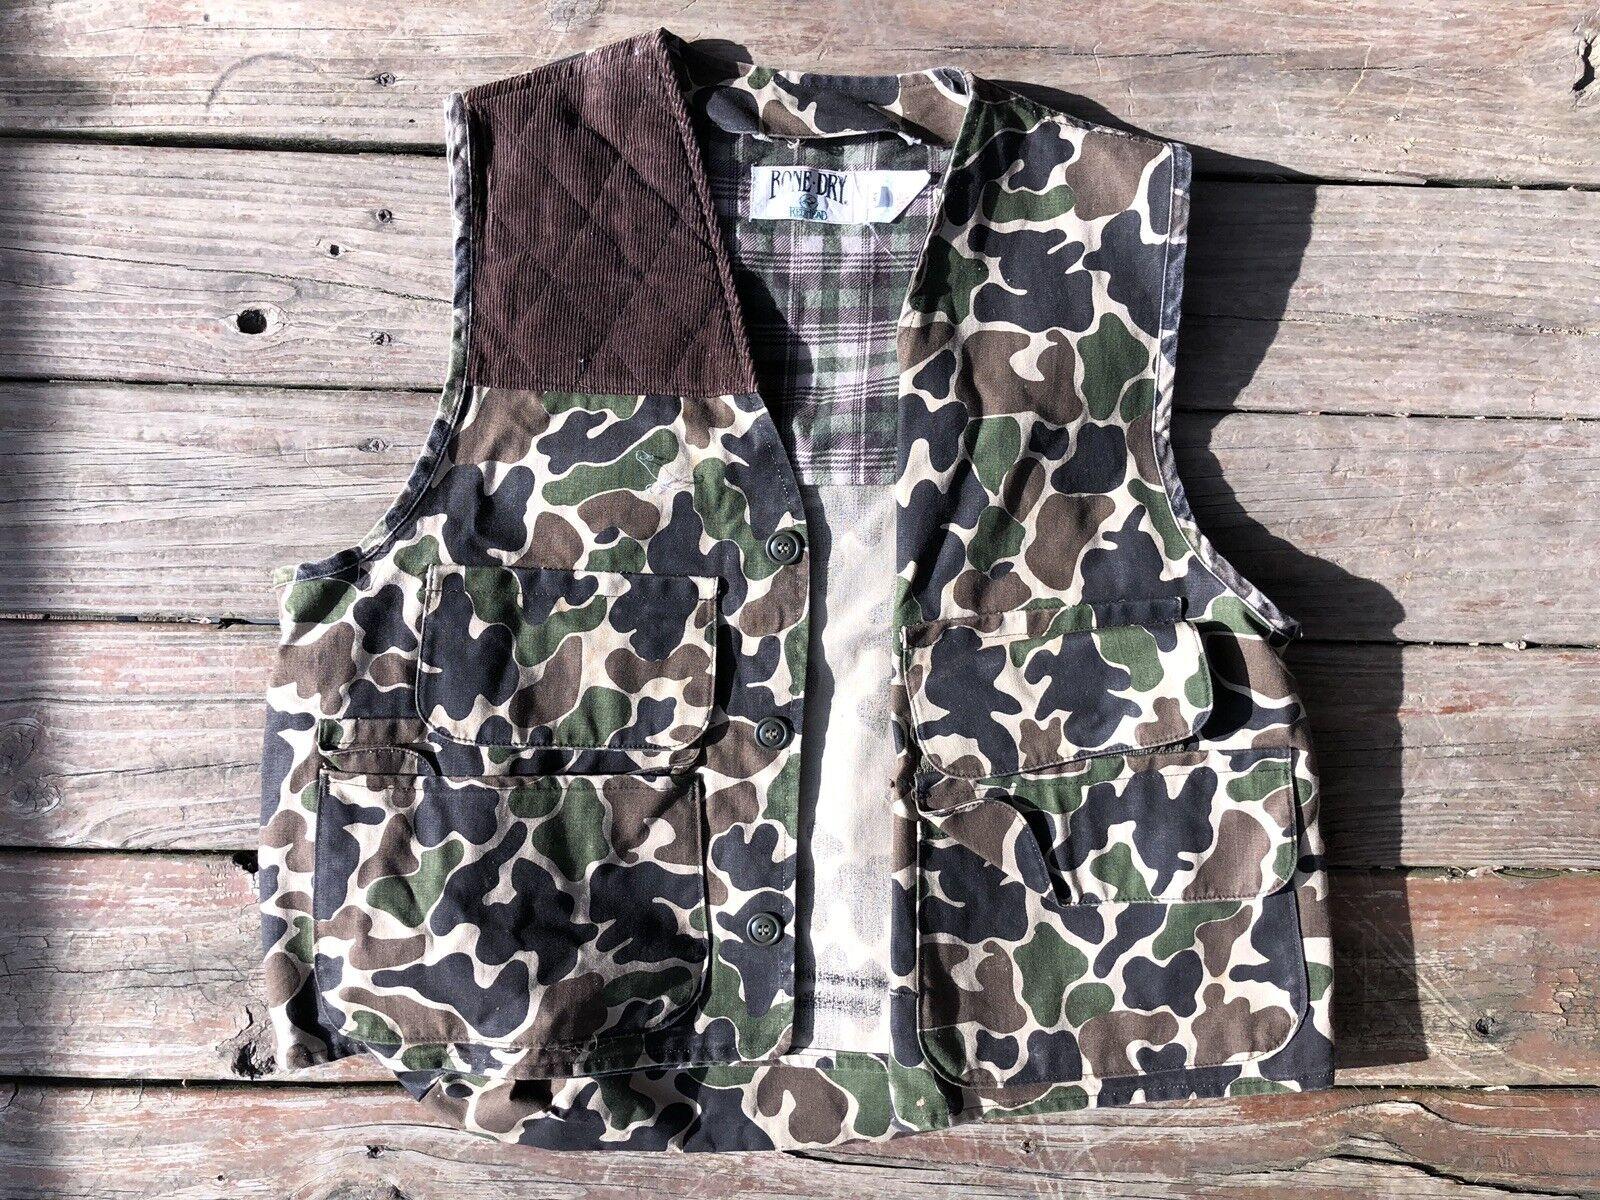 Red Head Bone Dry Bubble Camo Shooting vest XL- Vest Cut VTG Hiking Outdoor EUC